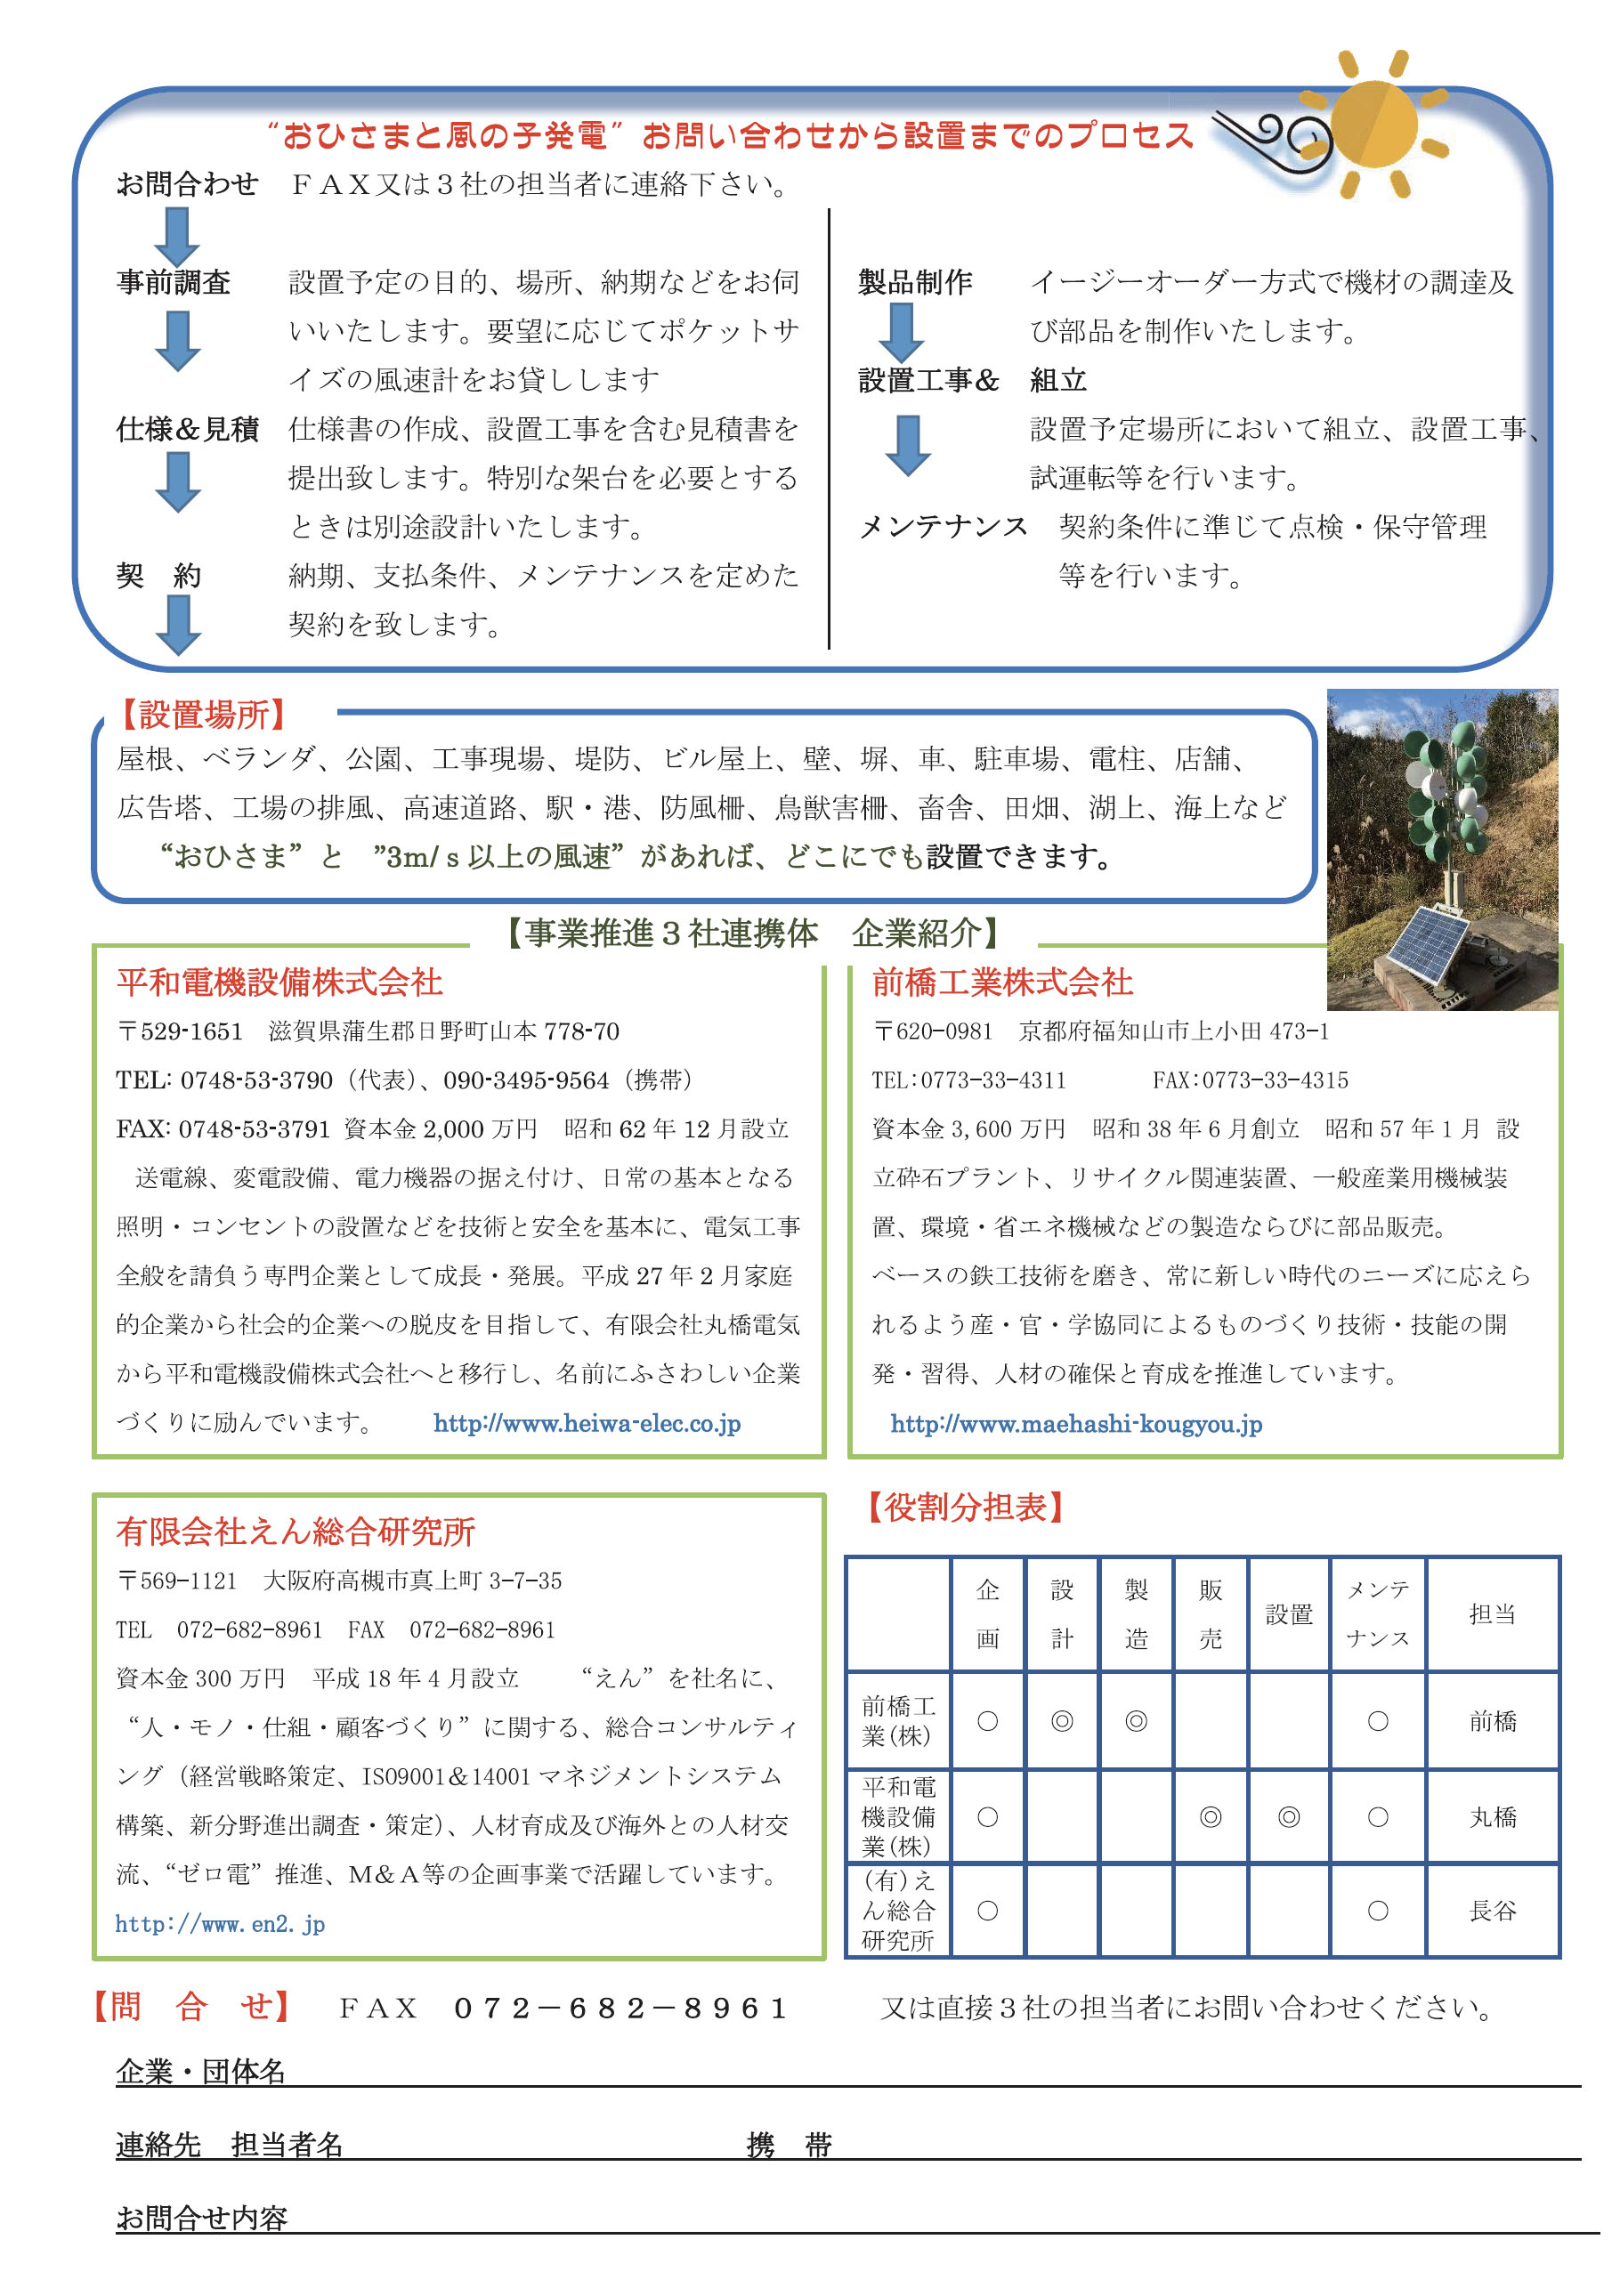 ohisama_kazenoko_powerplant_page2